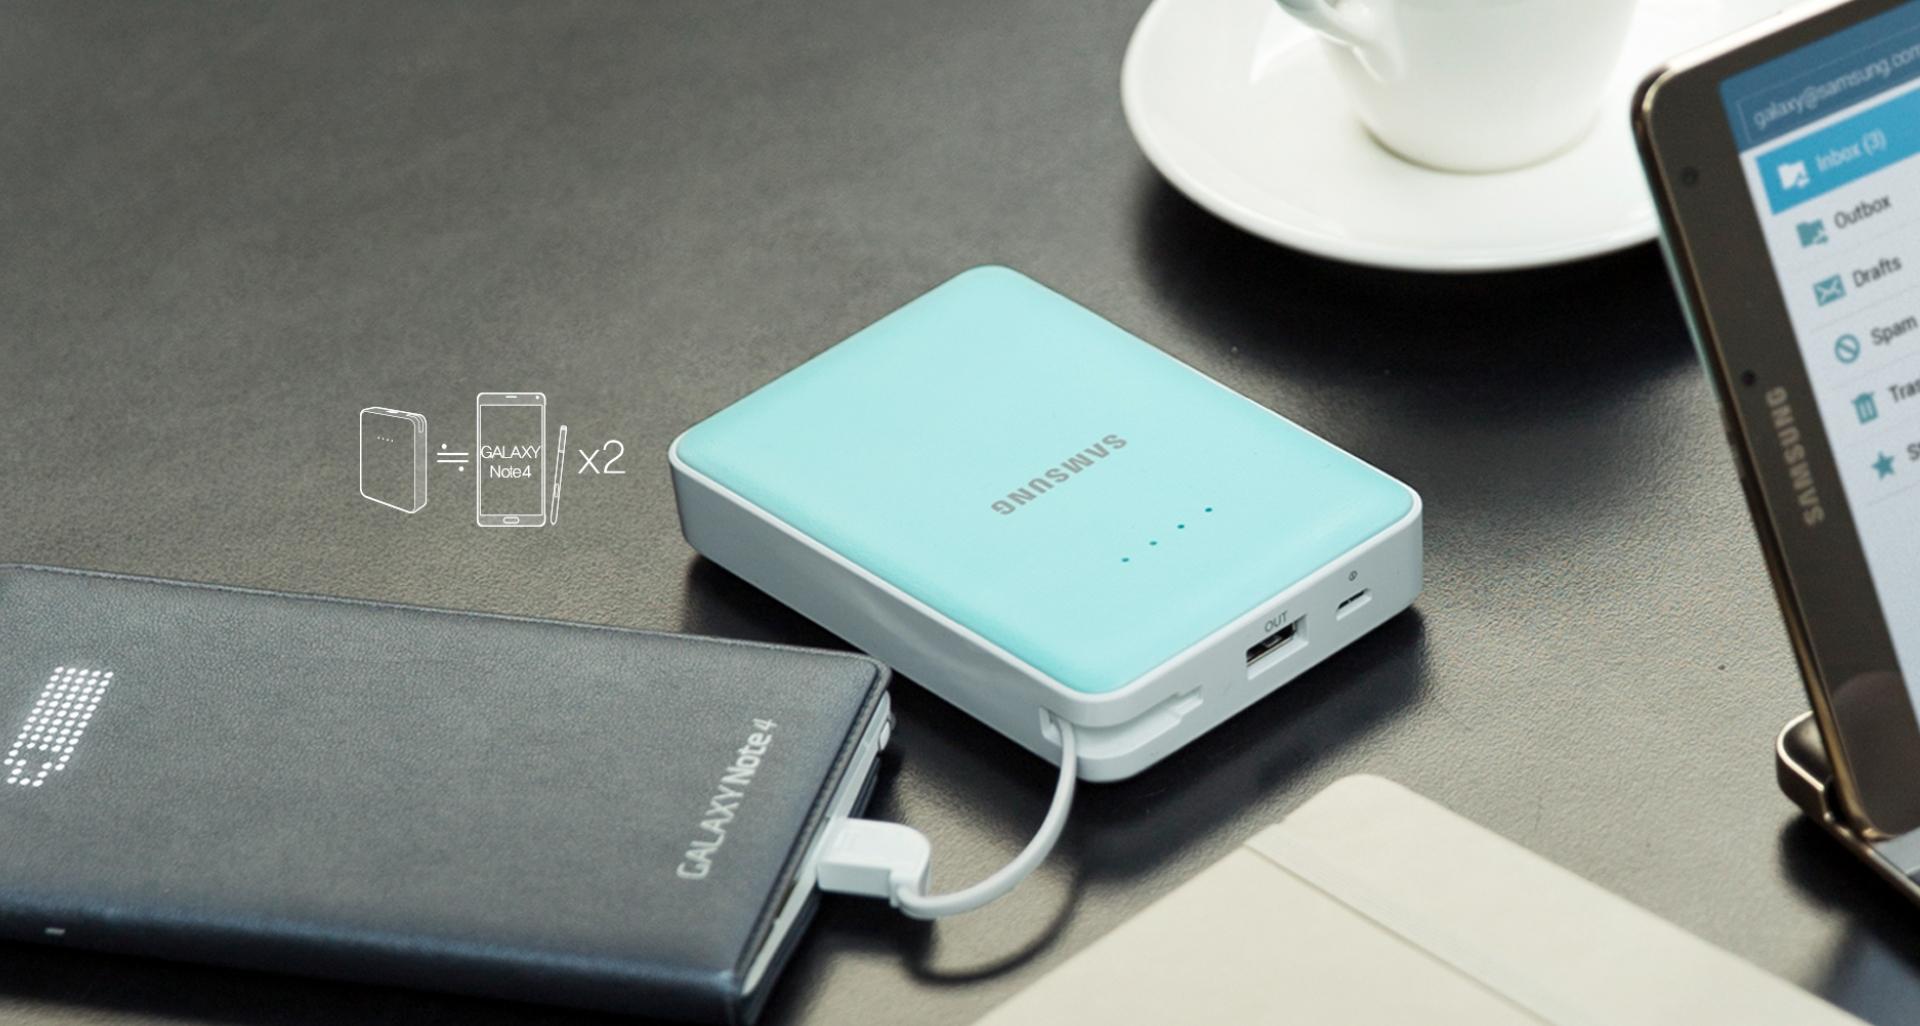 Acumulator universal extern cu incarcare rapida, Samsung EB-PG850